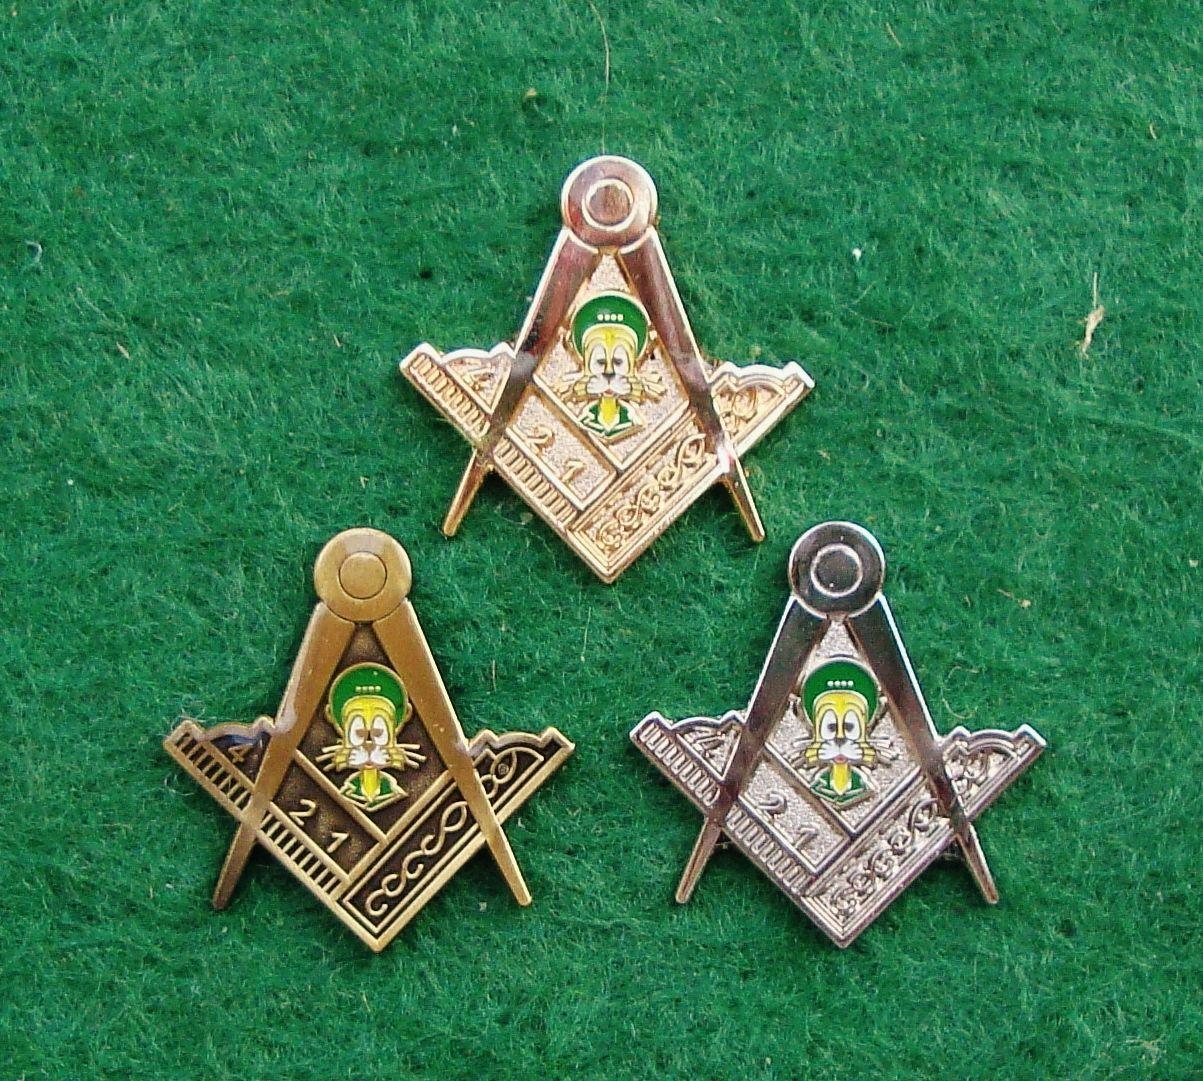 British Army Eod Bomb Disposal Masonic Felix Pin Badge Set Last Set